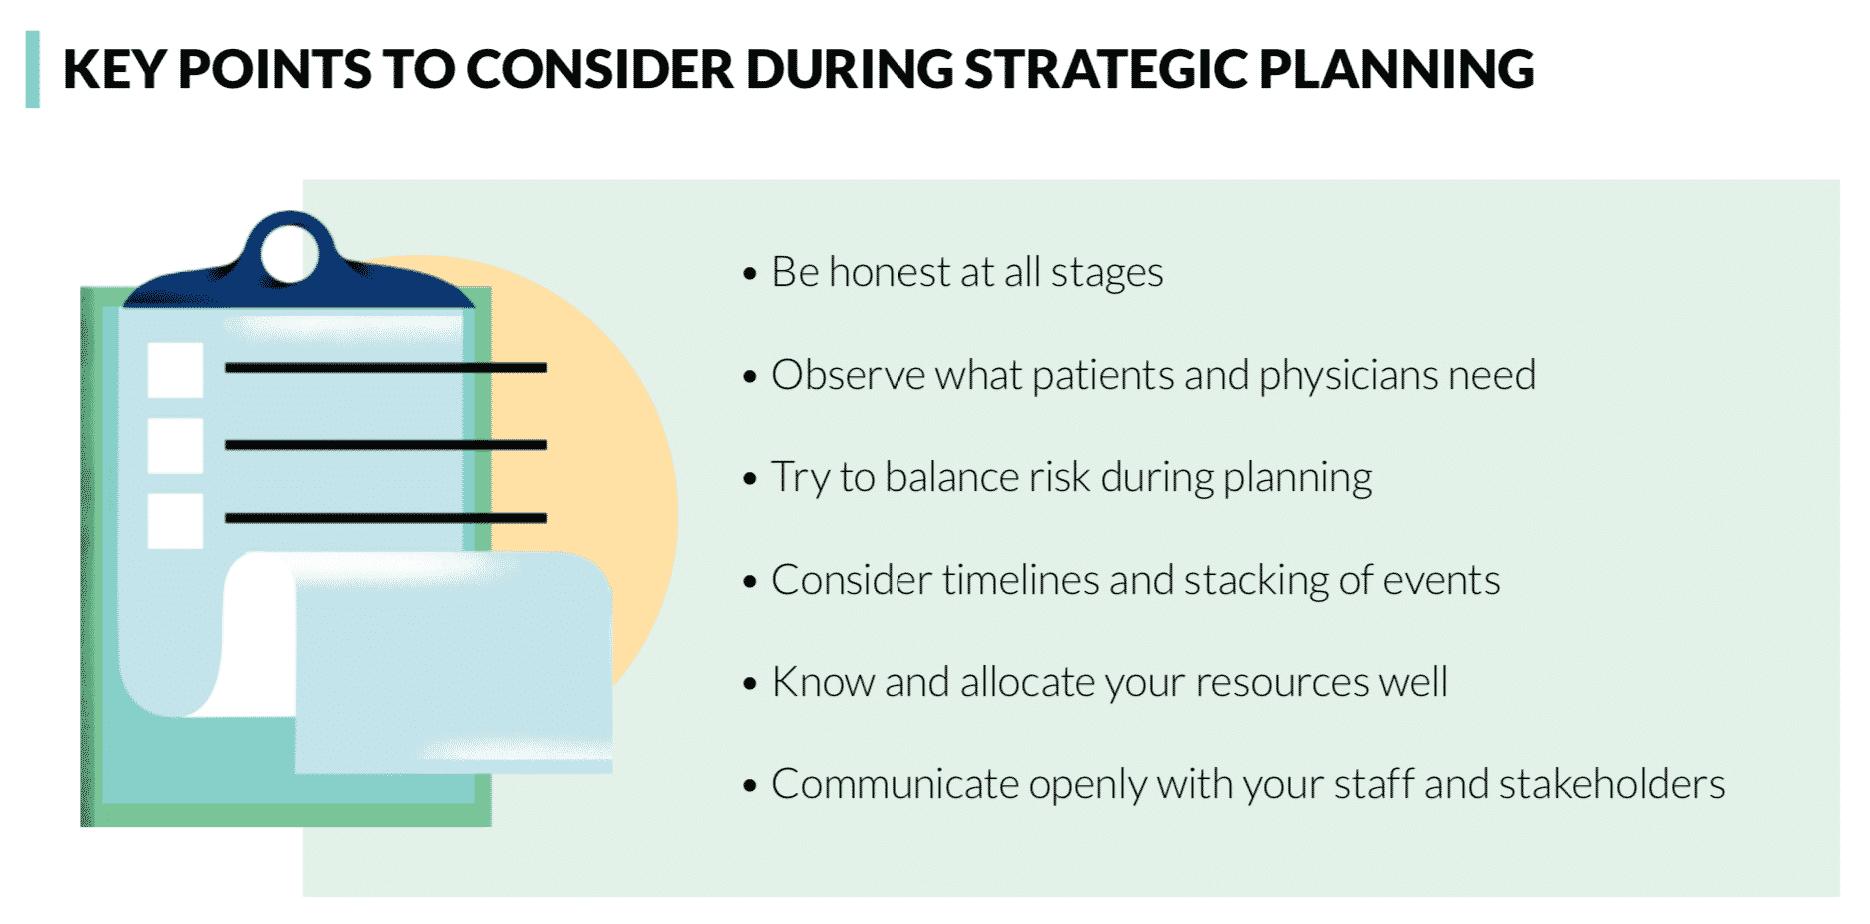 drug development strategy, strategic planning, considerations